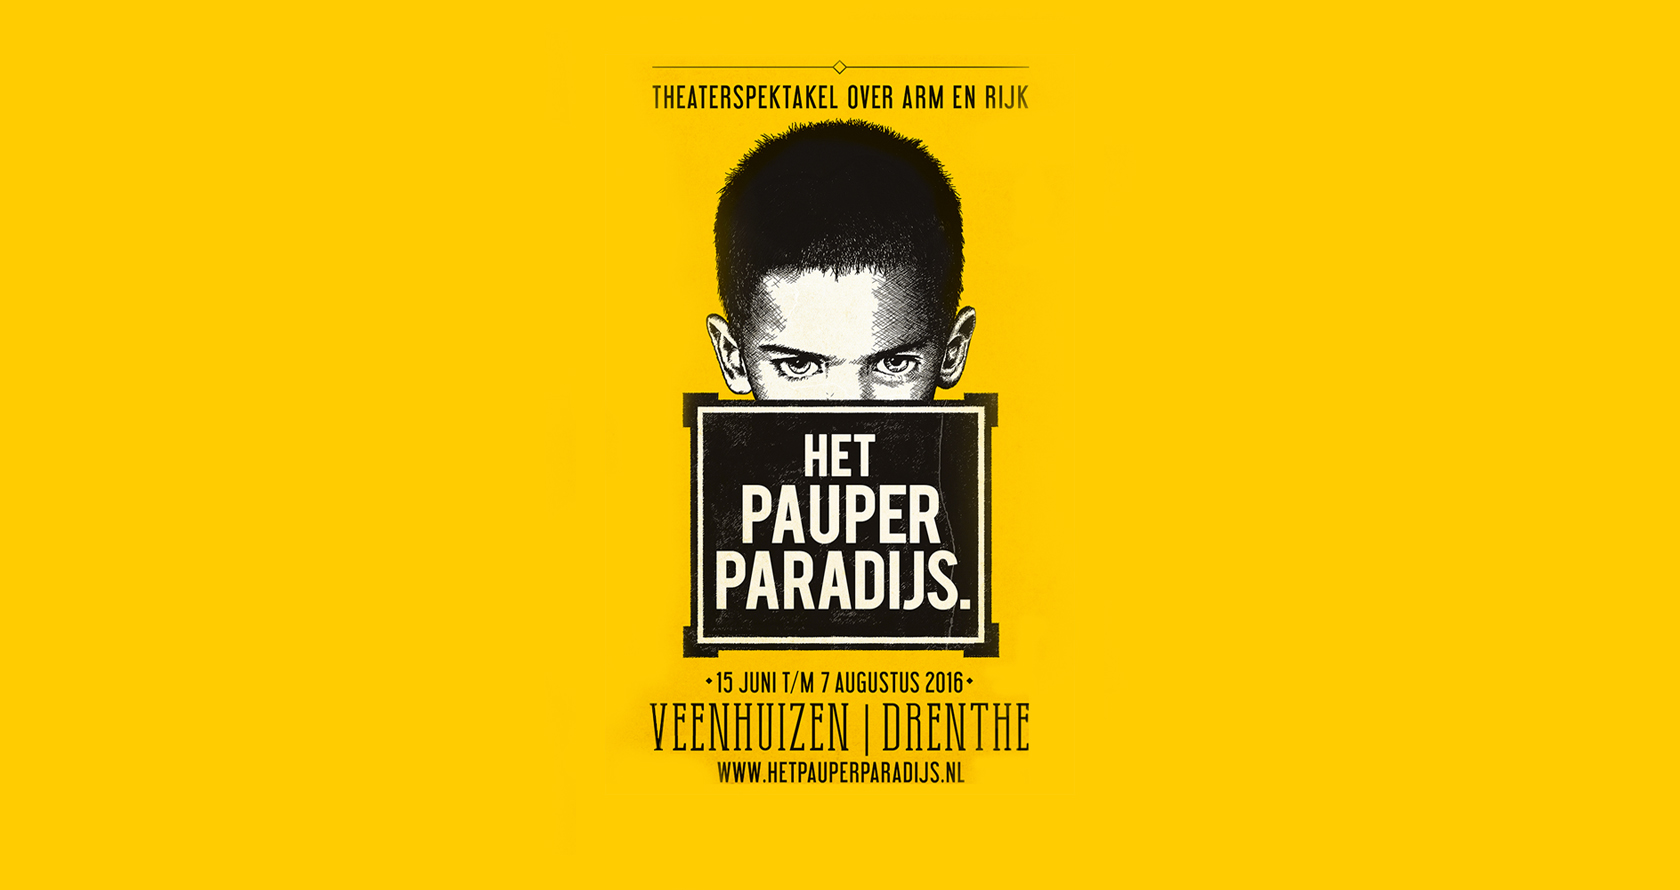 pauperparadijs-campagne-met-tekst-1